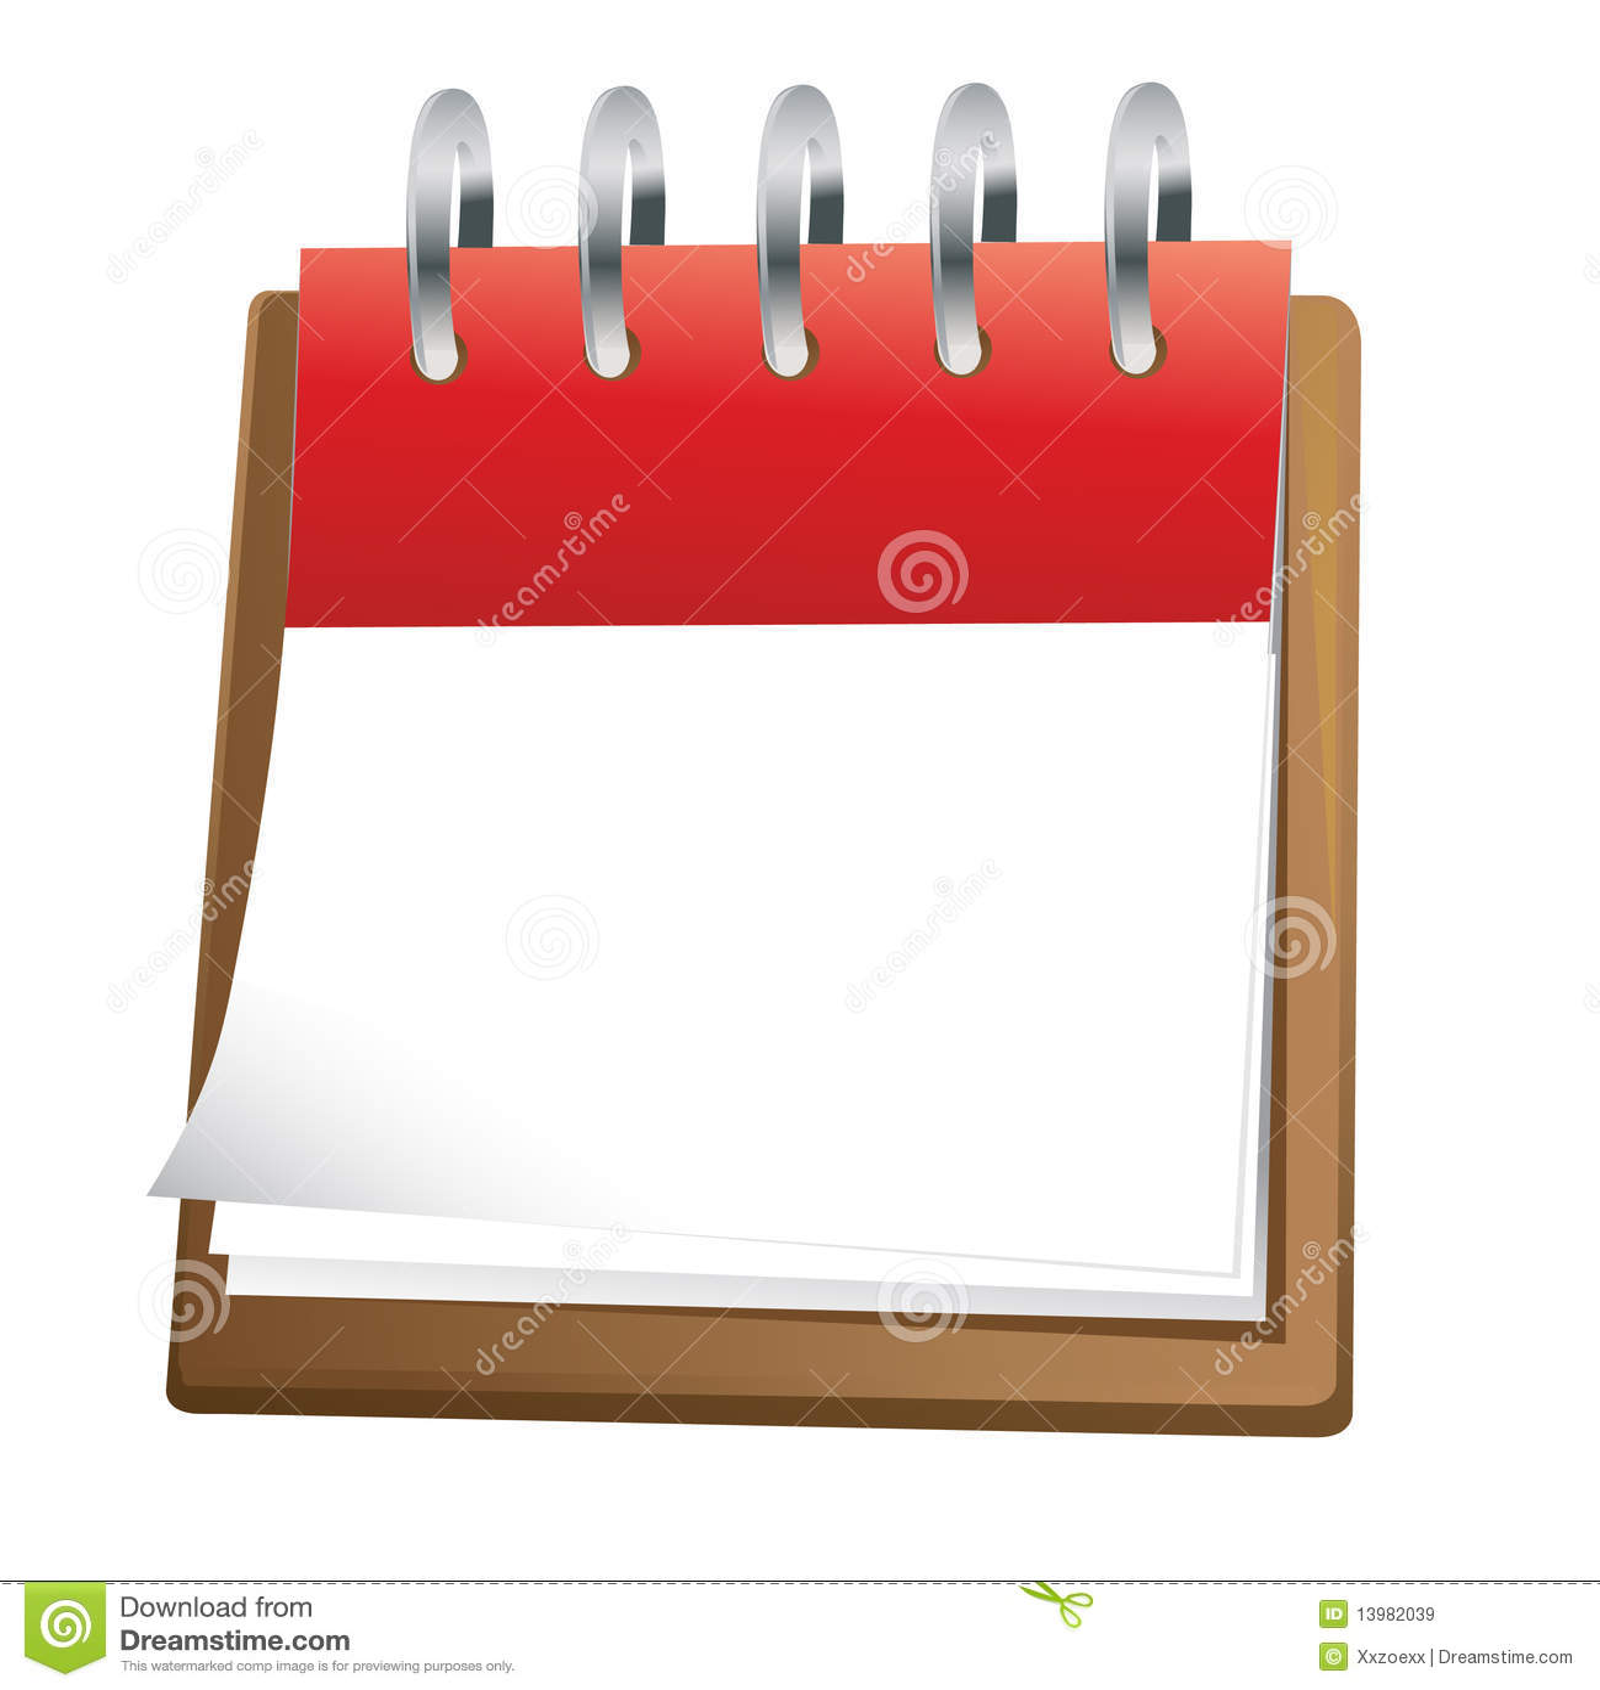 Blank Calendar Day Icon : Clipart images graphiques blanc de calendrier